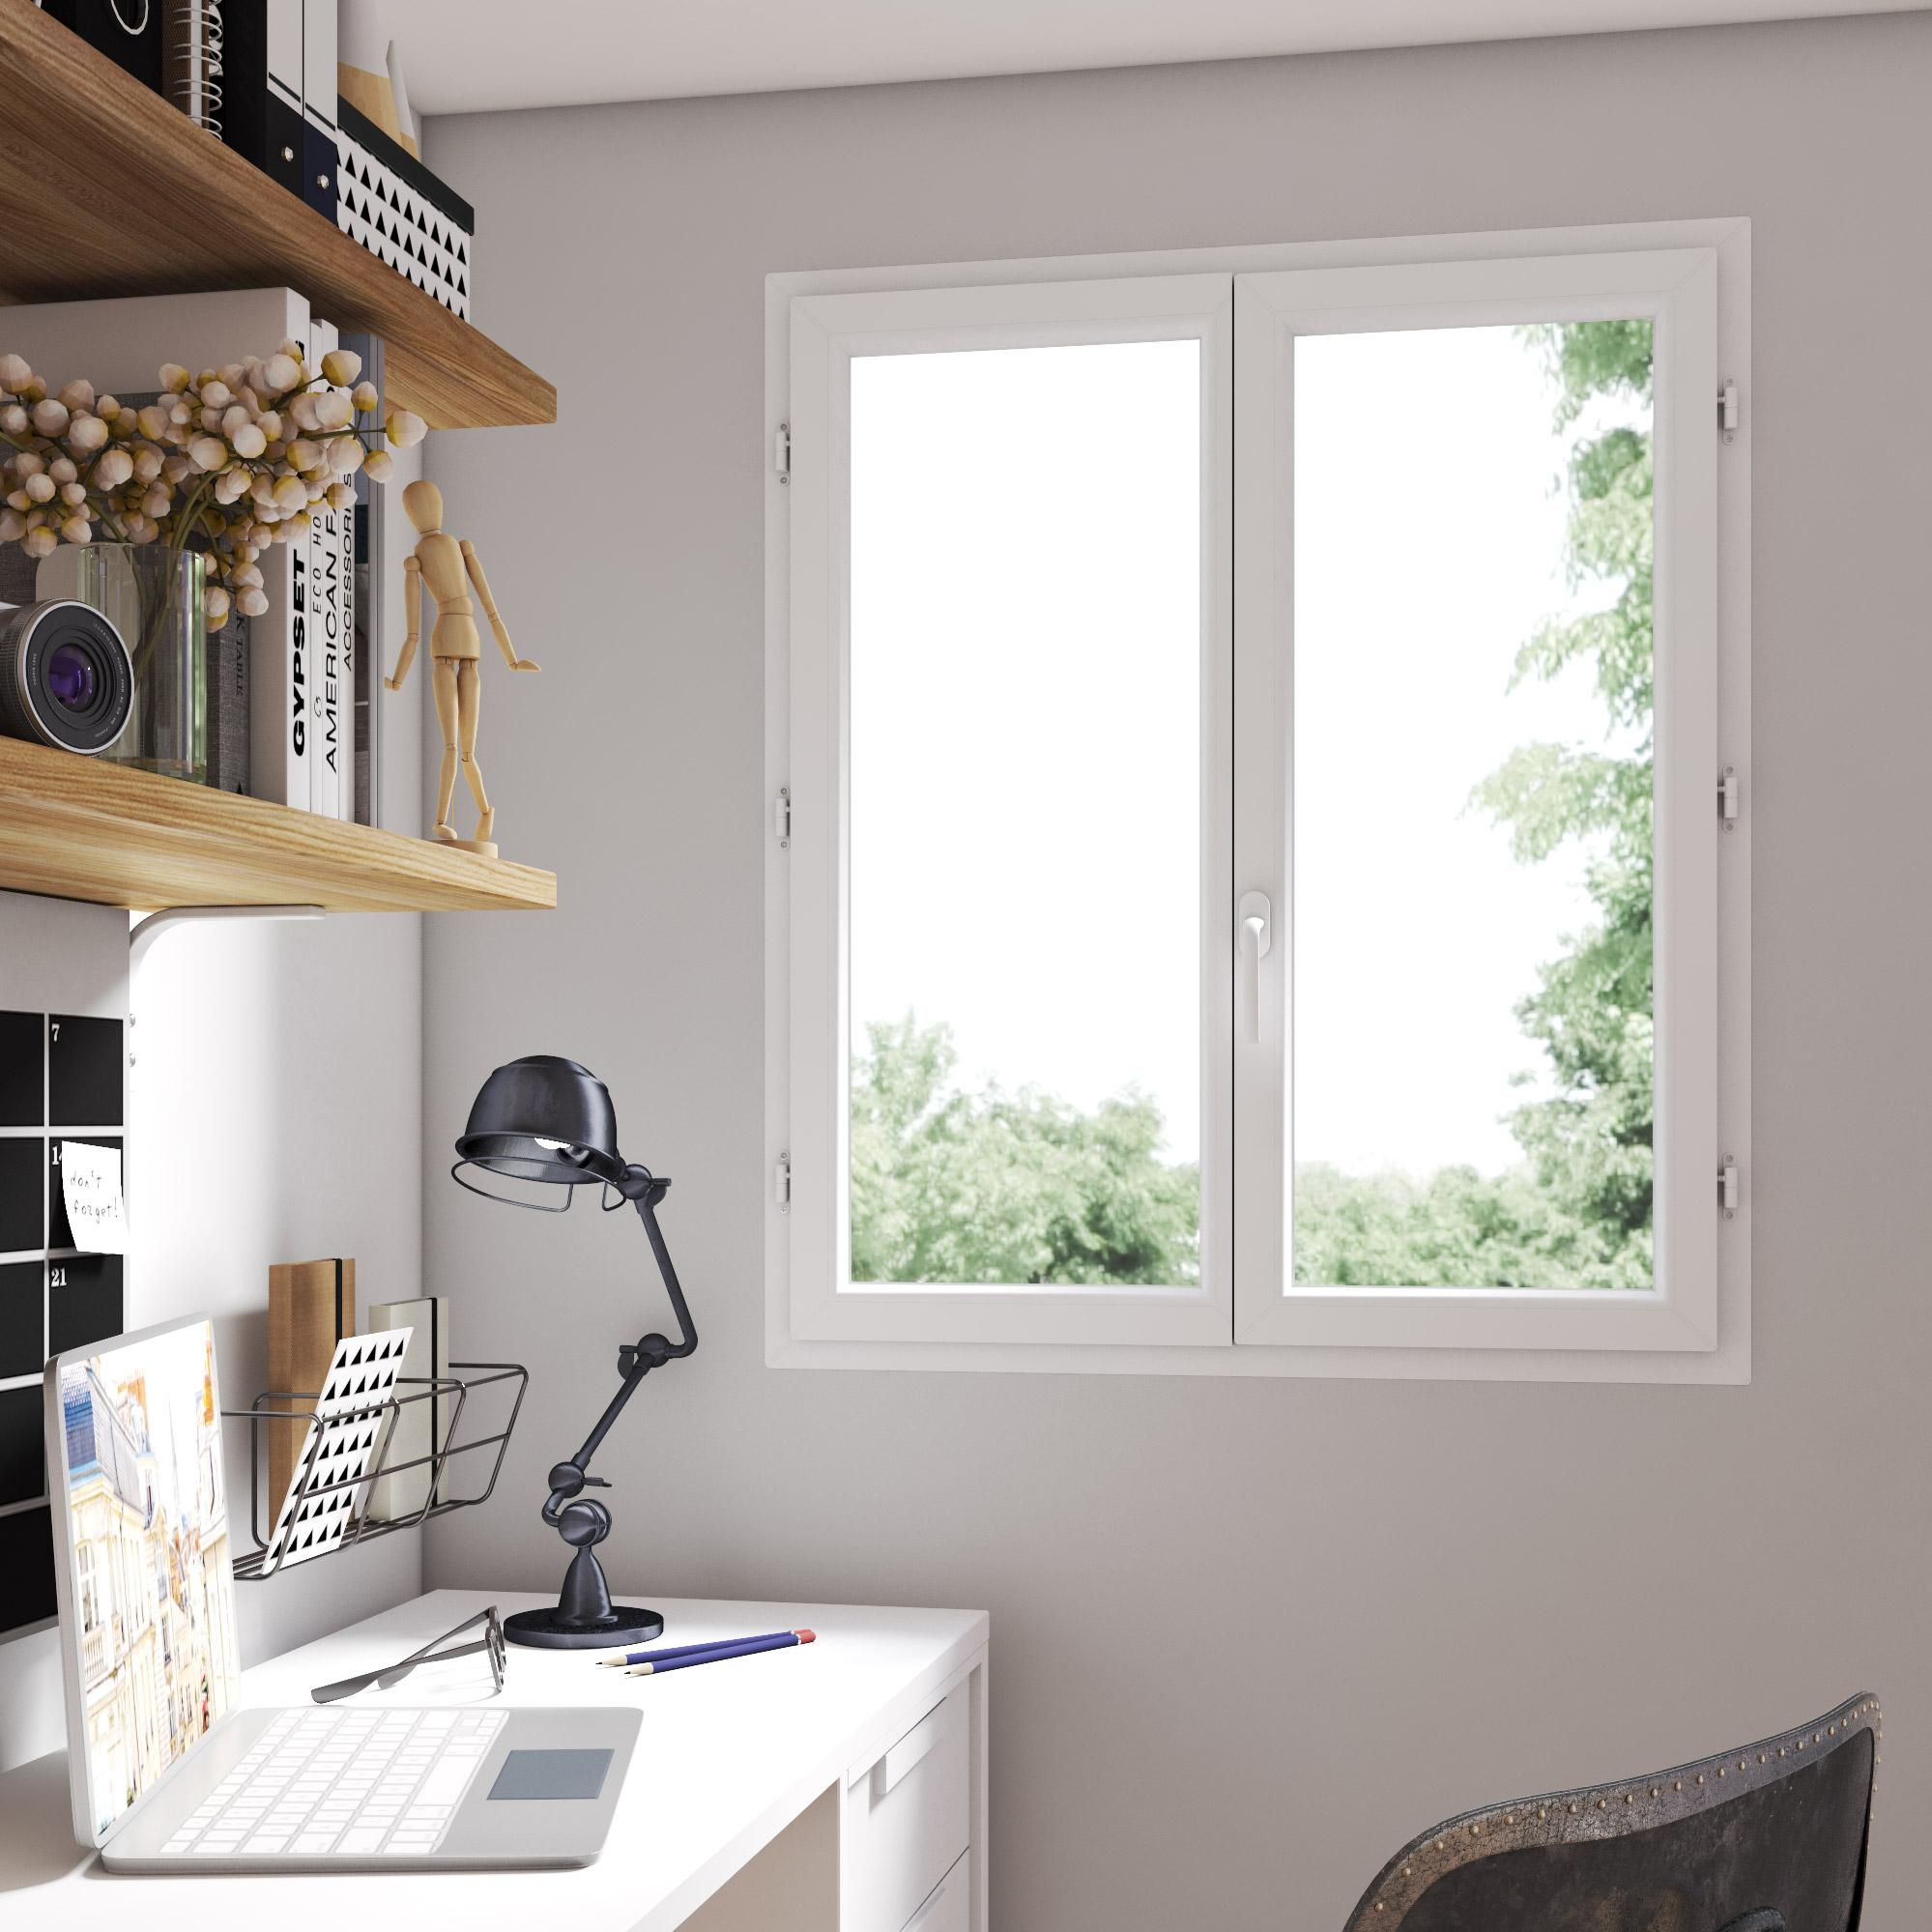 Fenêtre PVC H.115 x l.100 cm, blanc / blanc, 2 tirant droit